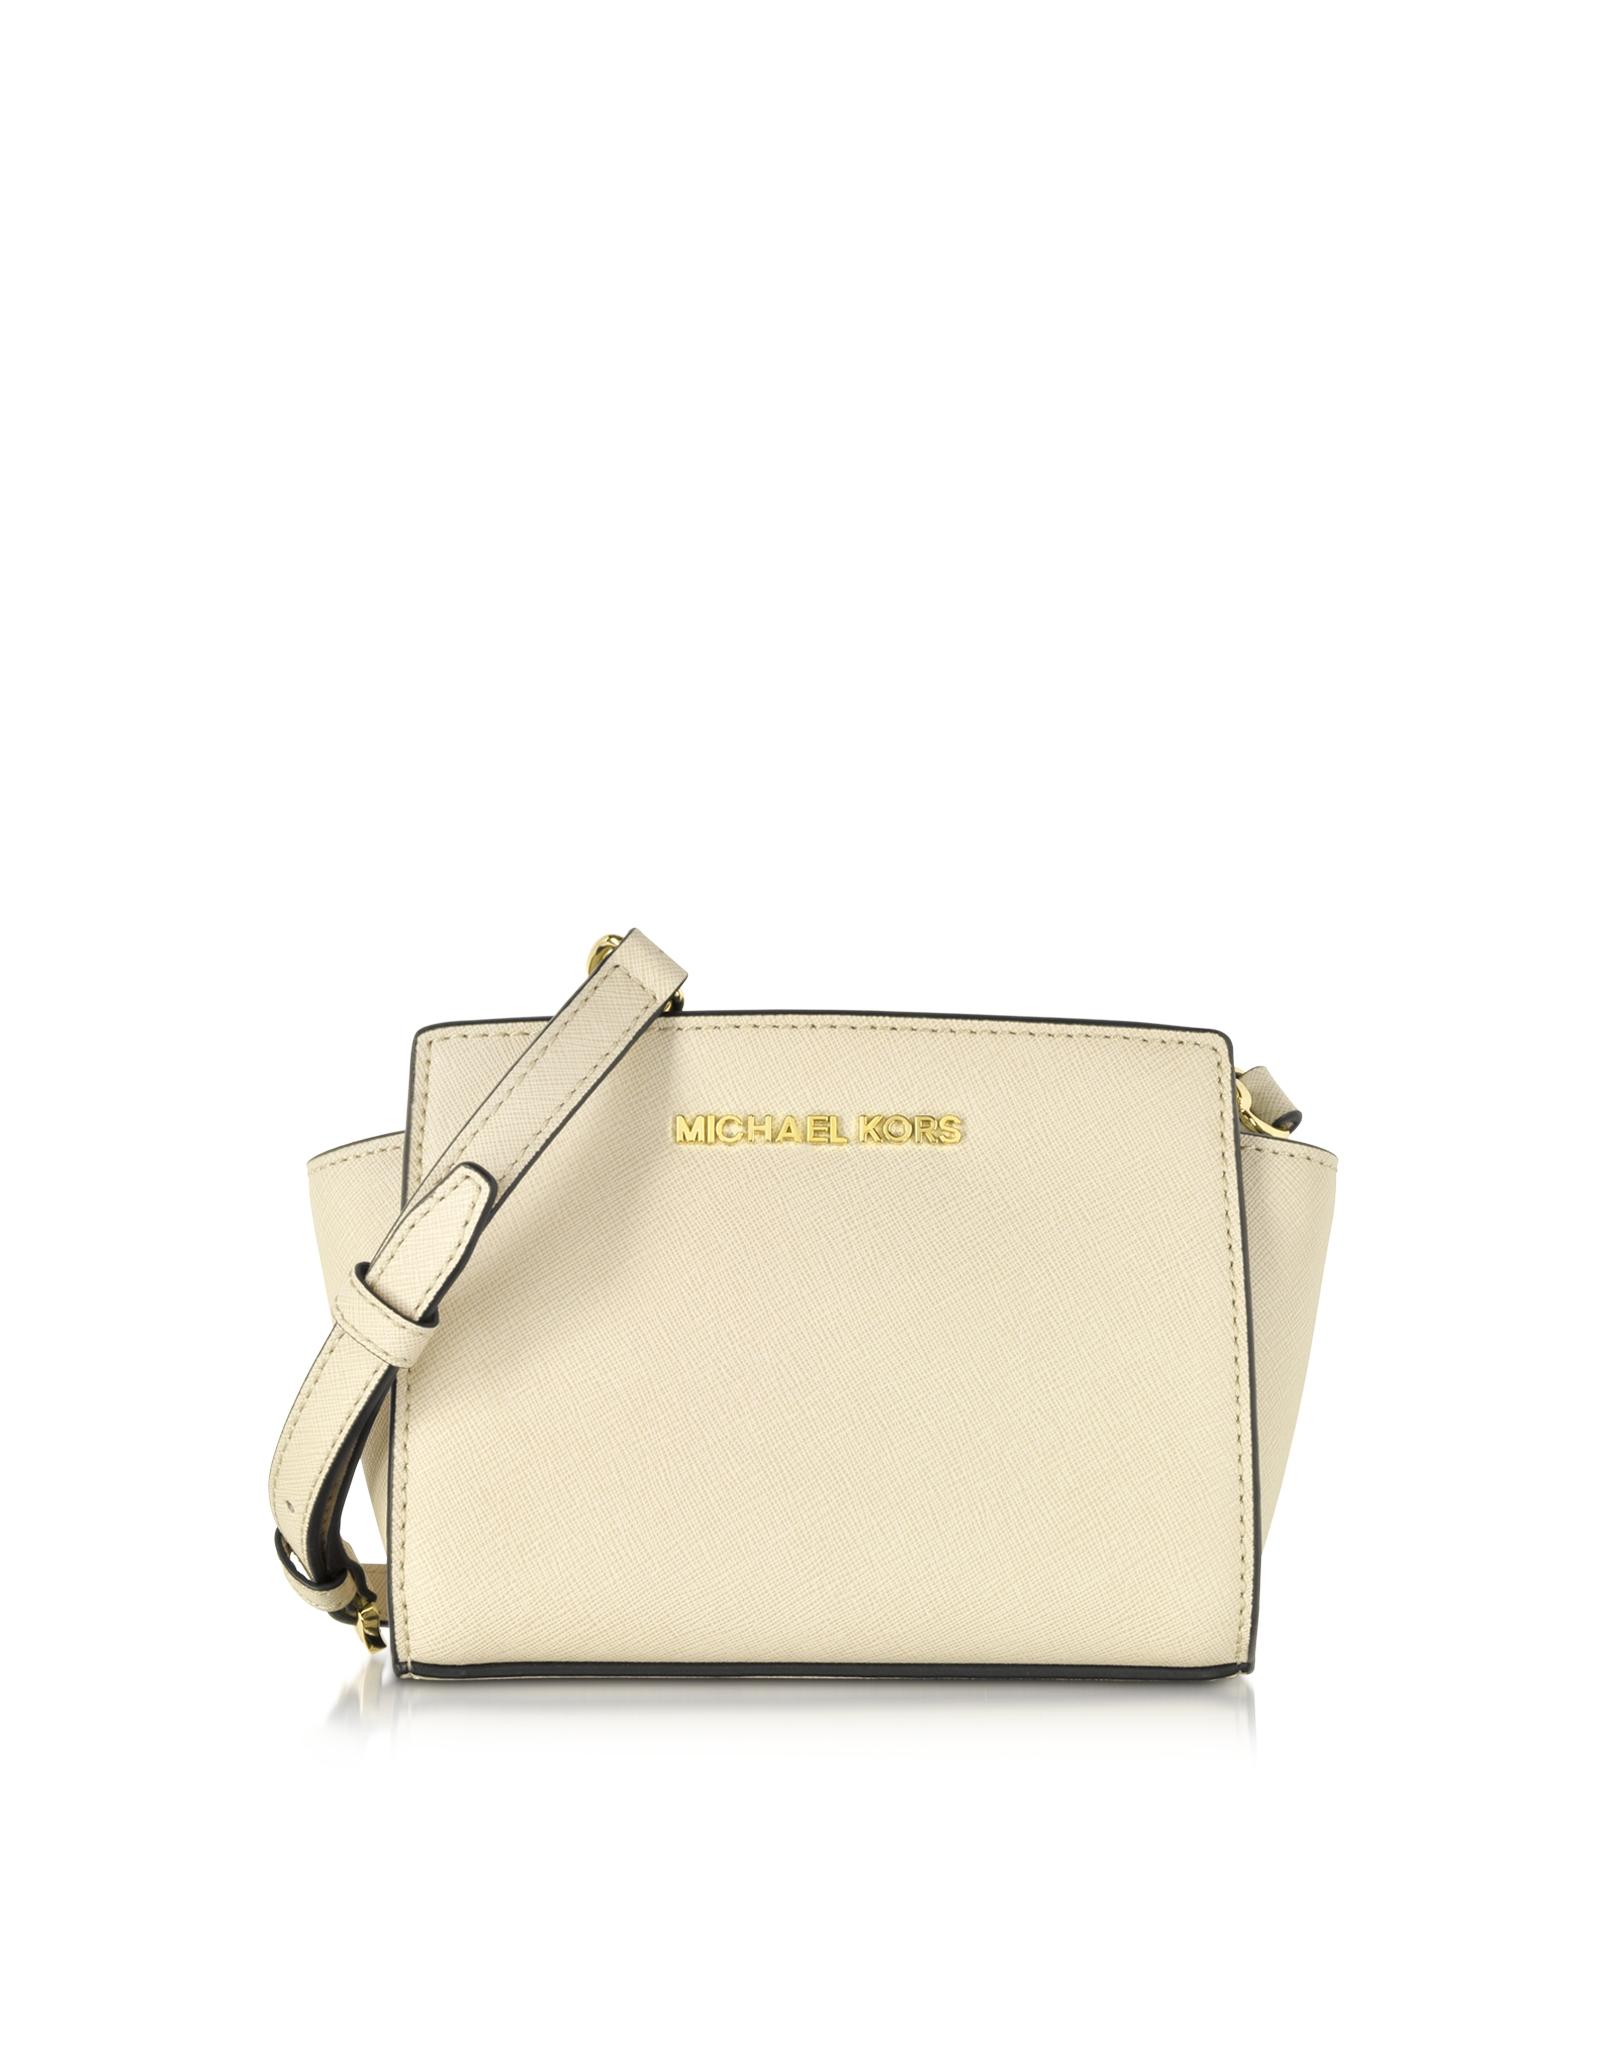 d3608622828c35 Michael Kors Ecru Saffiano Leather Selma Mini Messenger Bag in ...